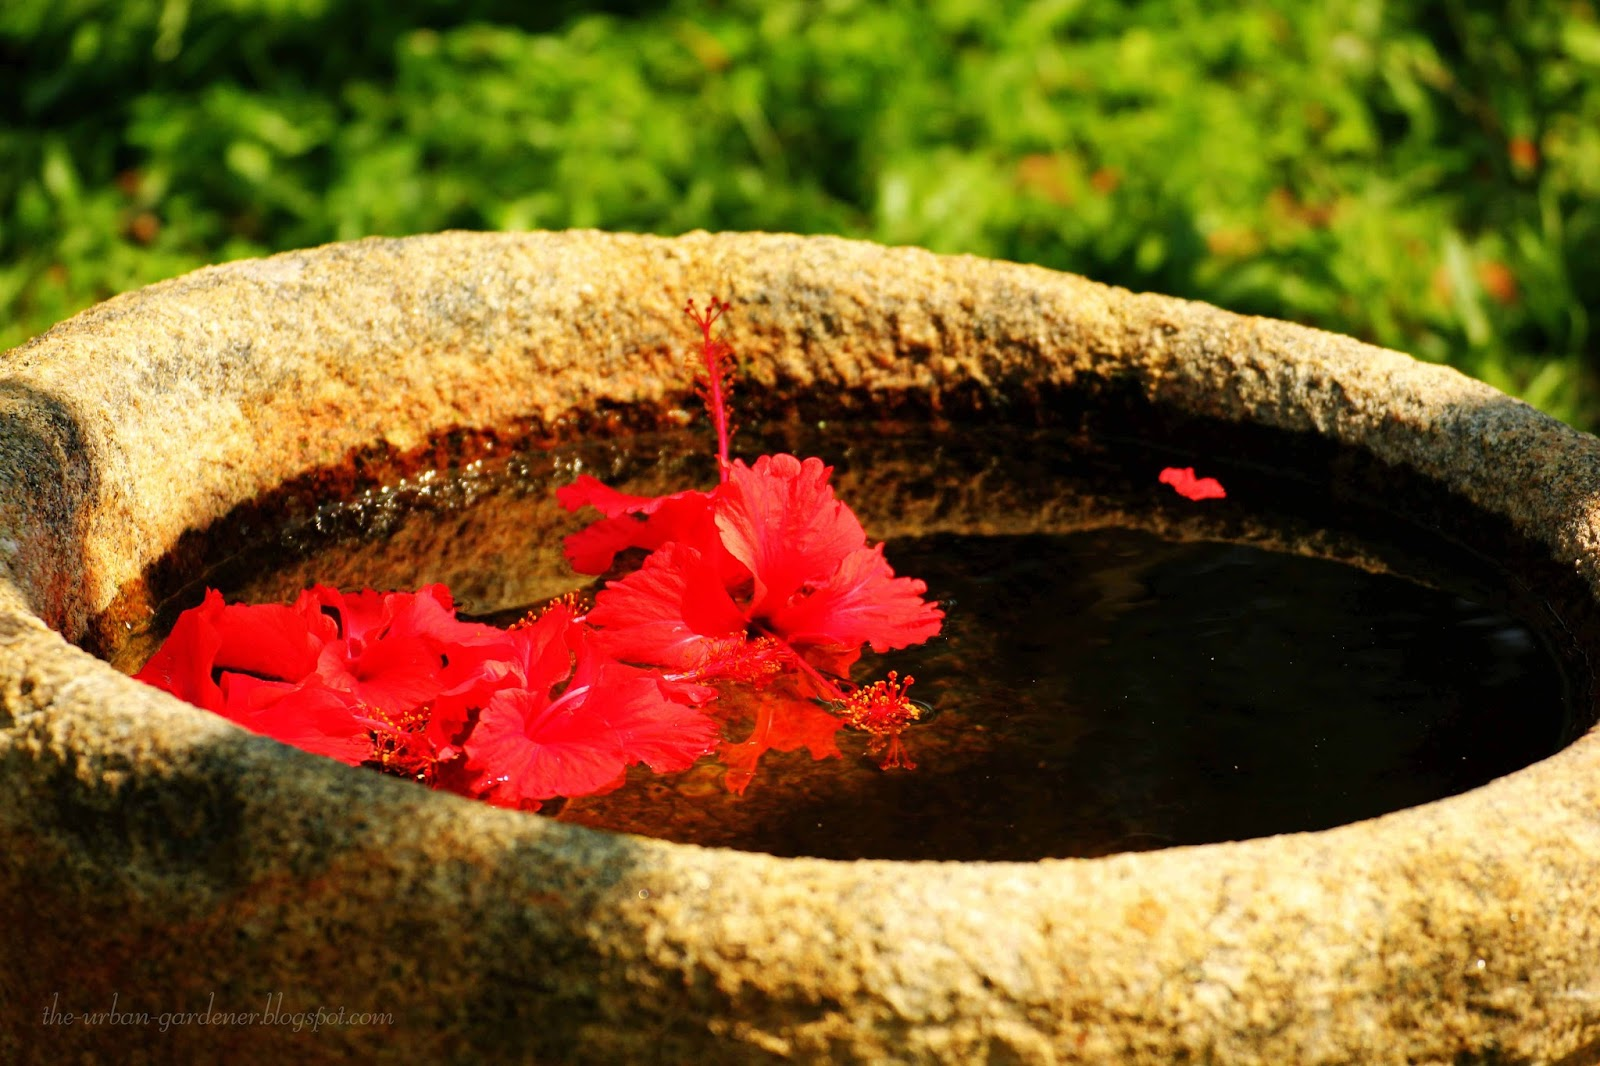 The Urban Gardener | Stone Trough With Hibiscus